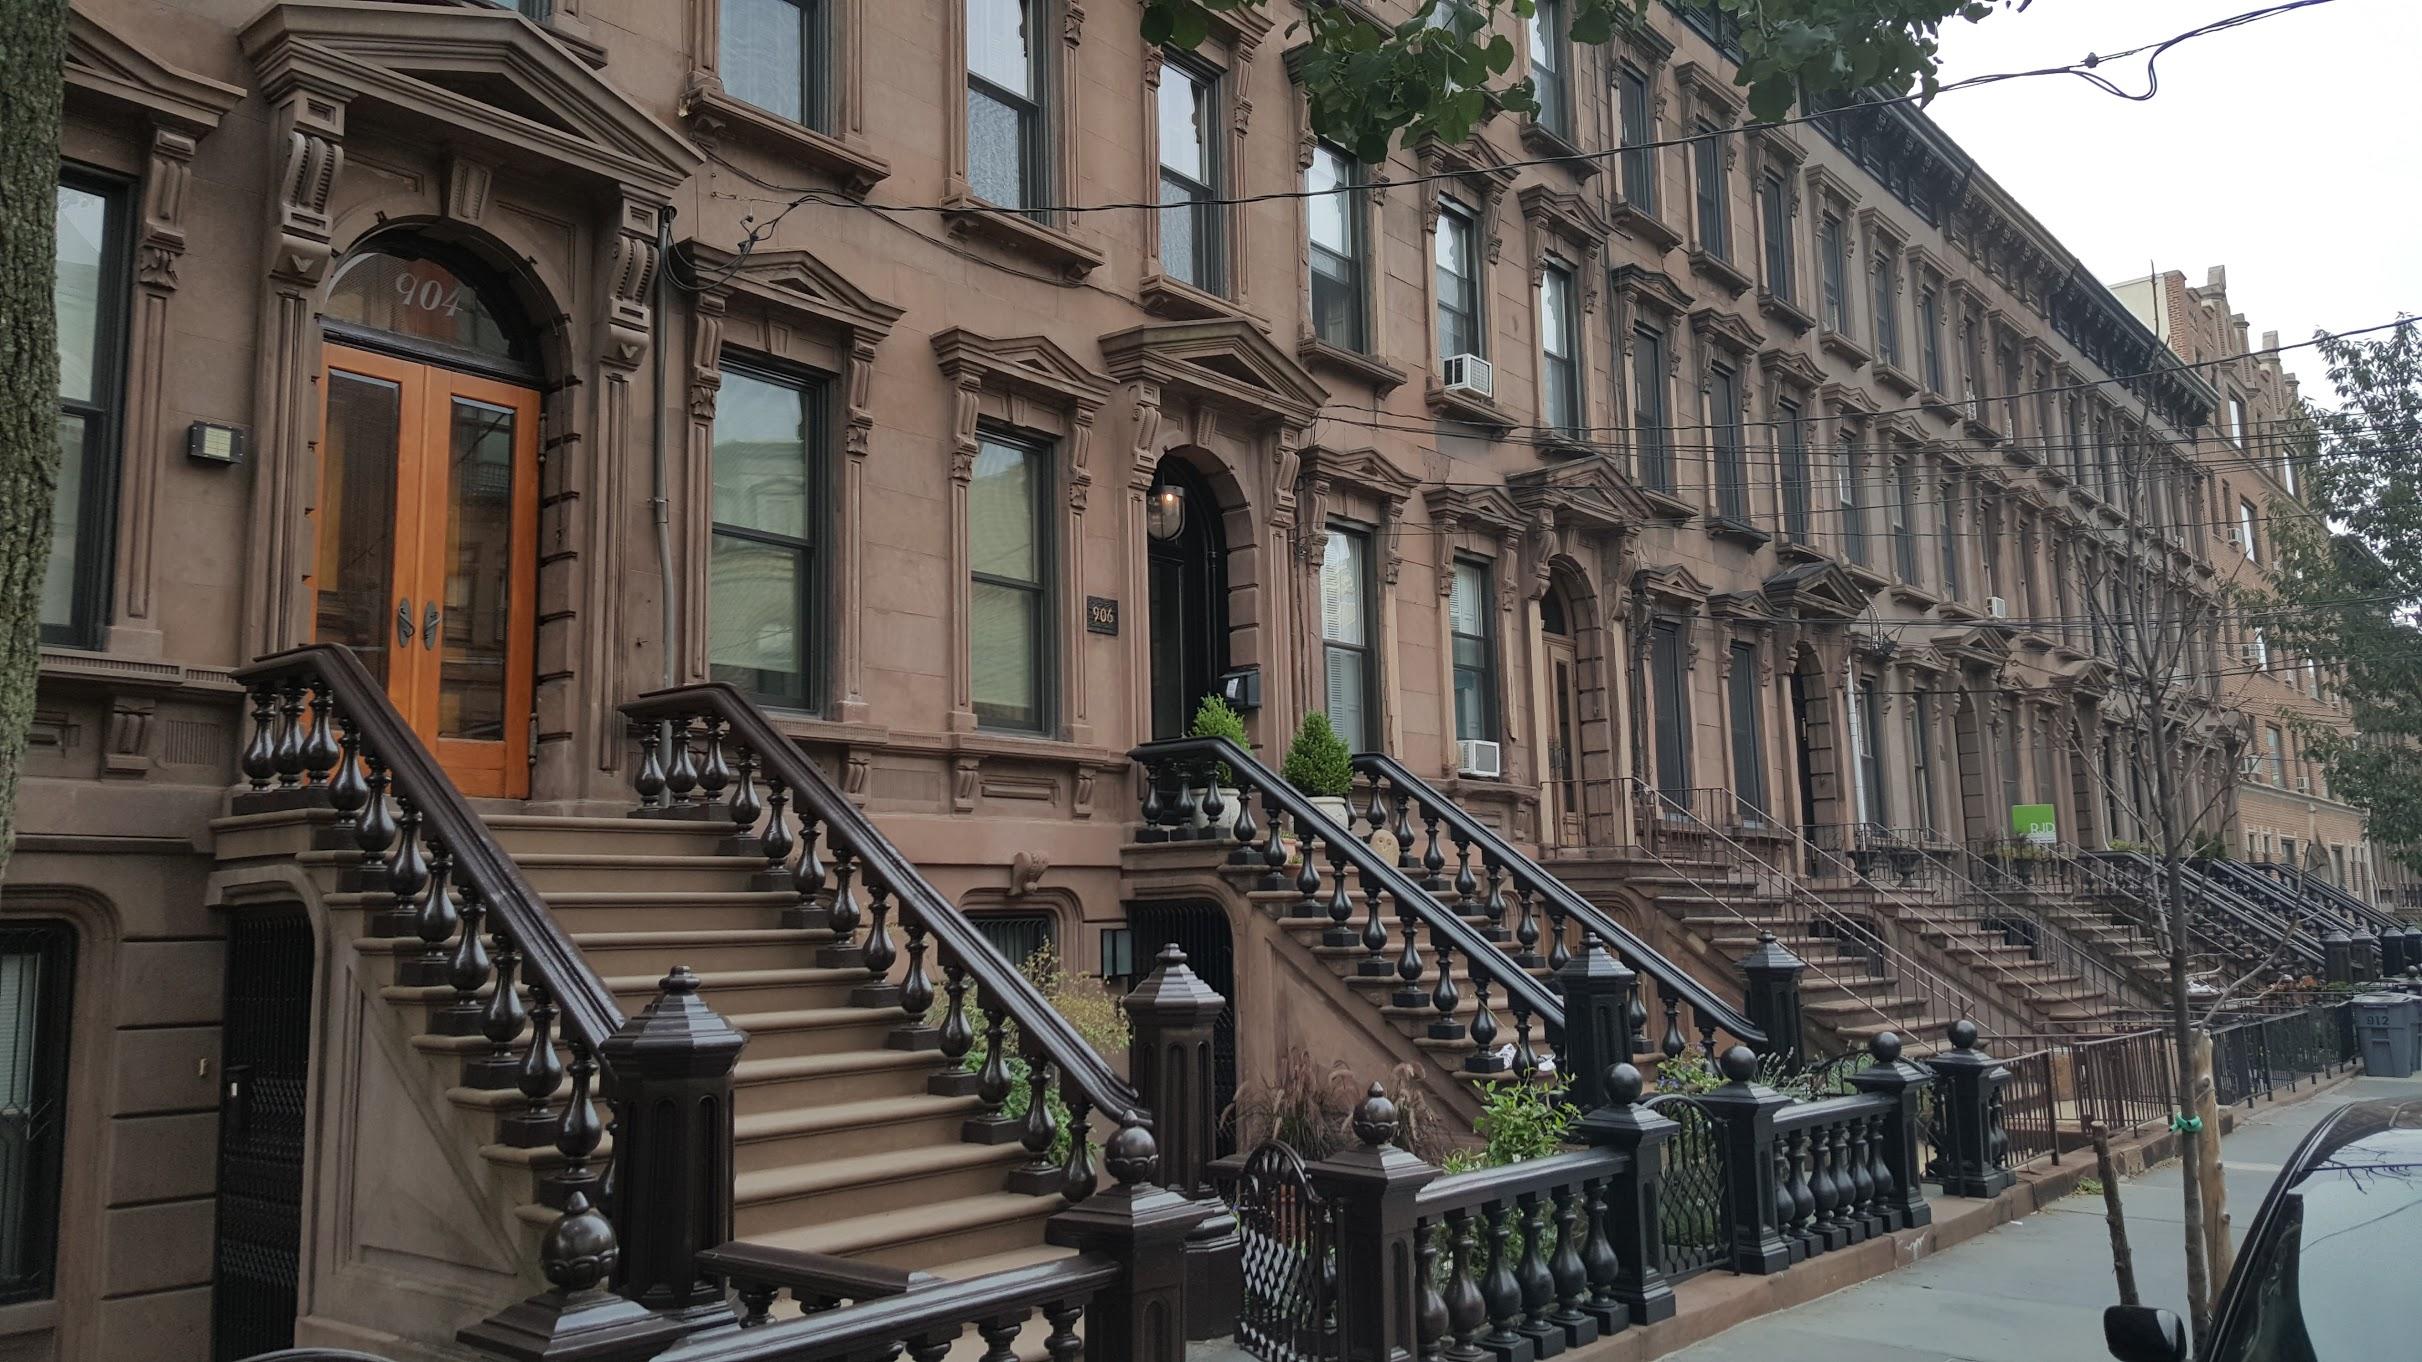 Traditional homes along my street in Hoboken.